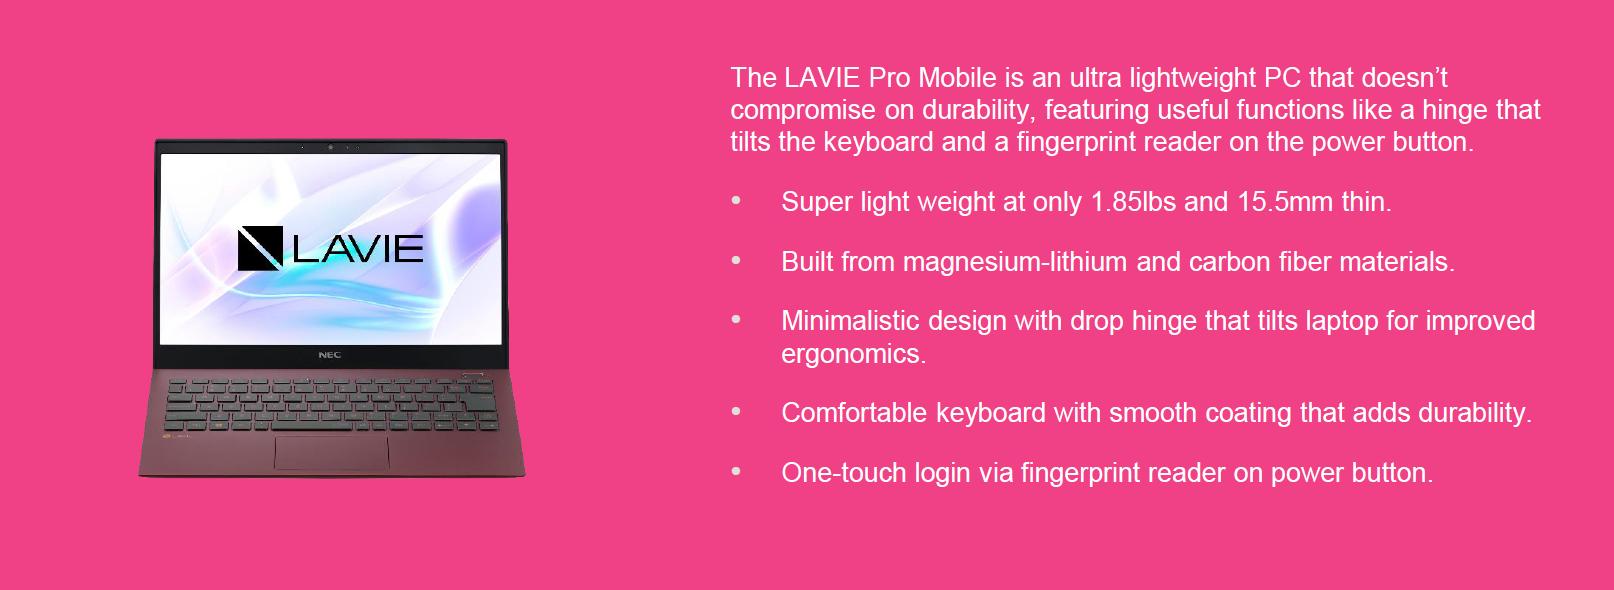 CES 2020: Lenovo partner LAVIE brings Japanese minimalism to productivity OnMSFT.com January 3, 2020